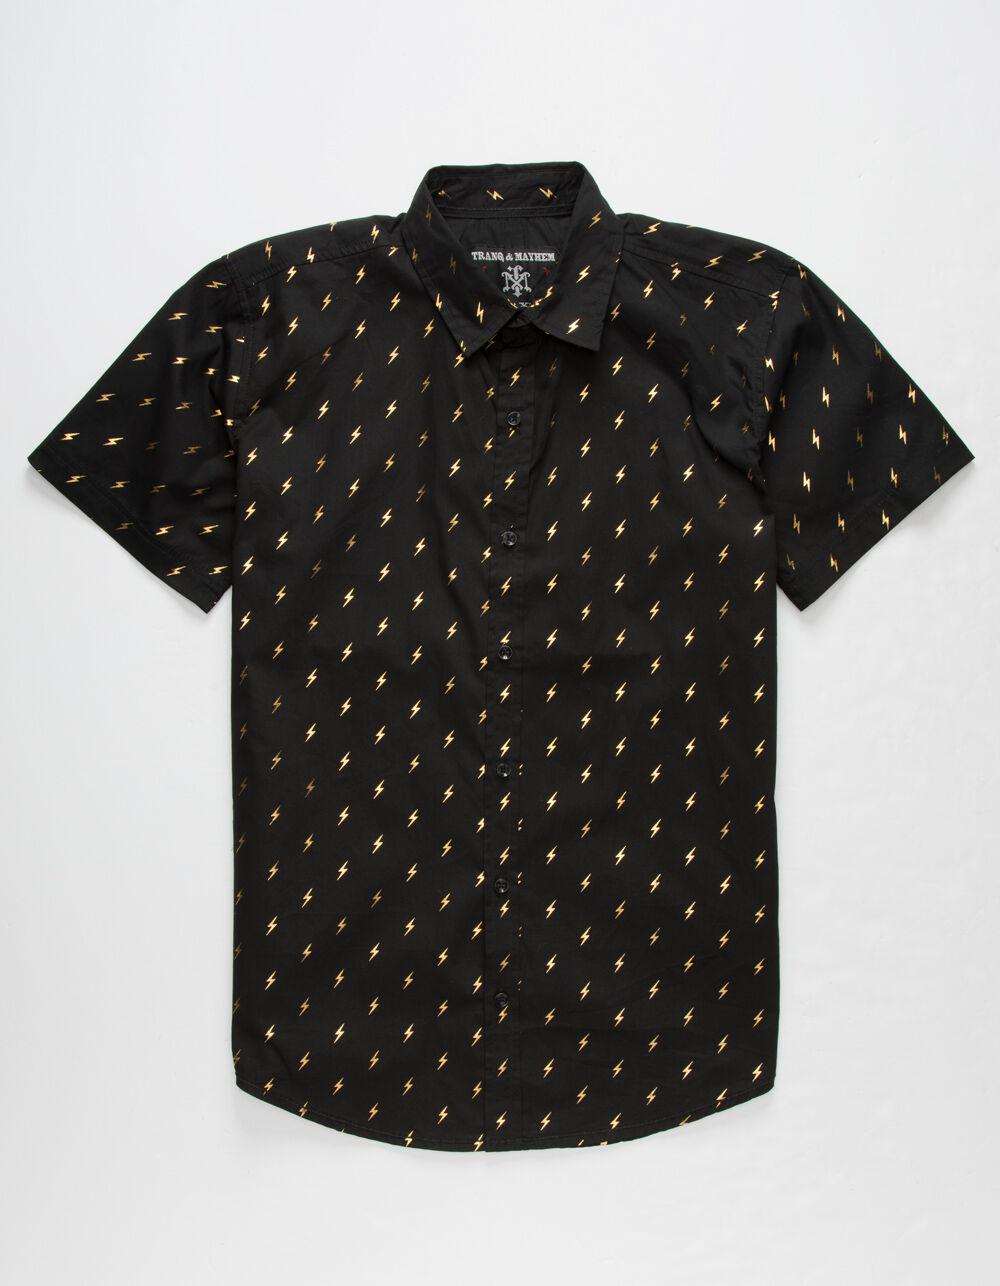 Image of TRANQUILITY & MAYHEM Bolts Boys Button-Up Shirt